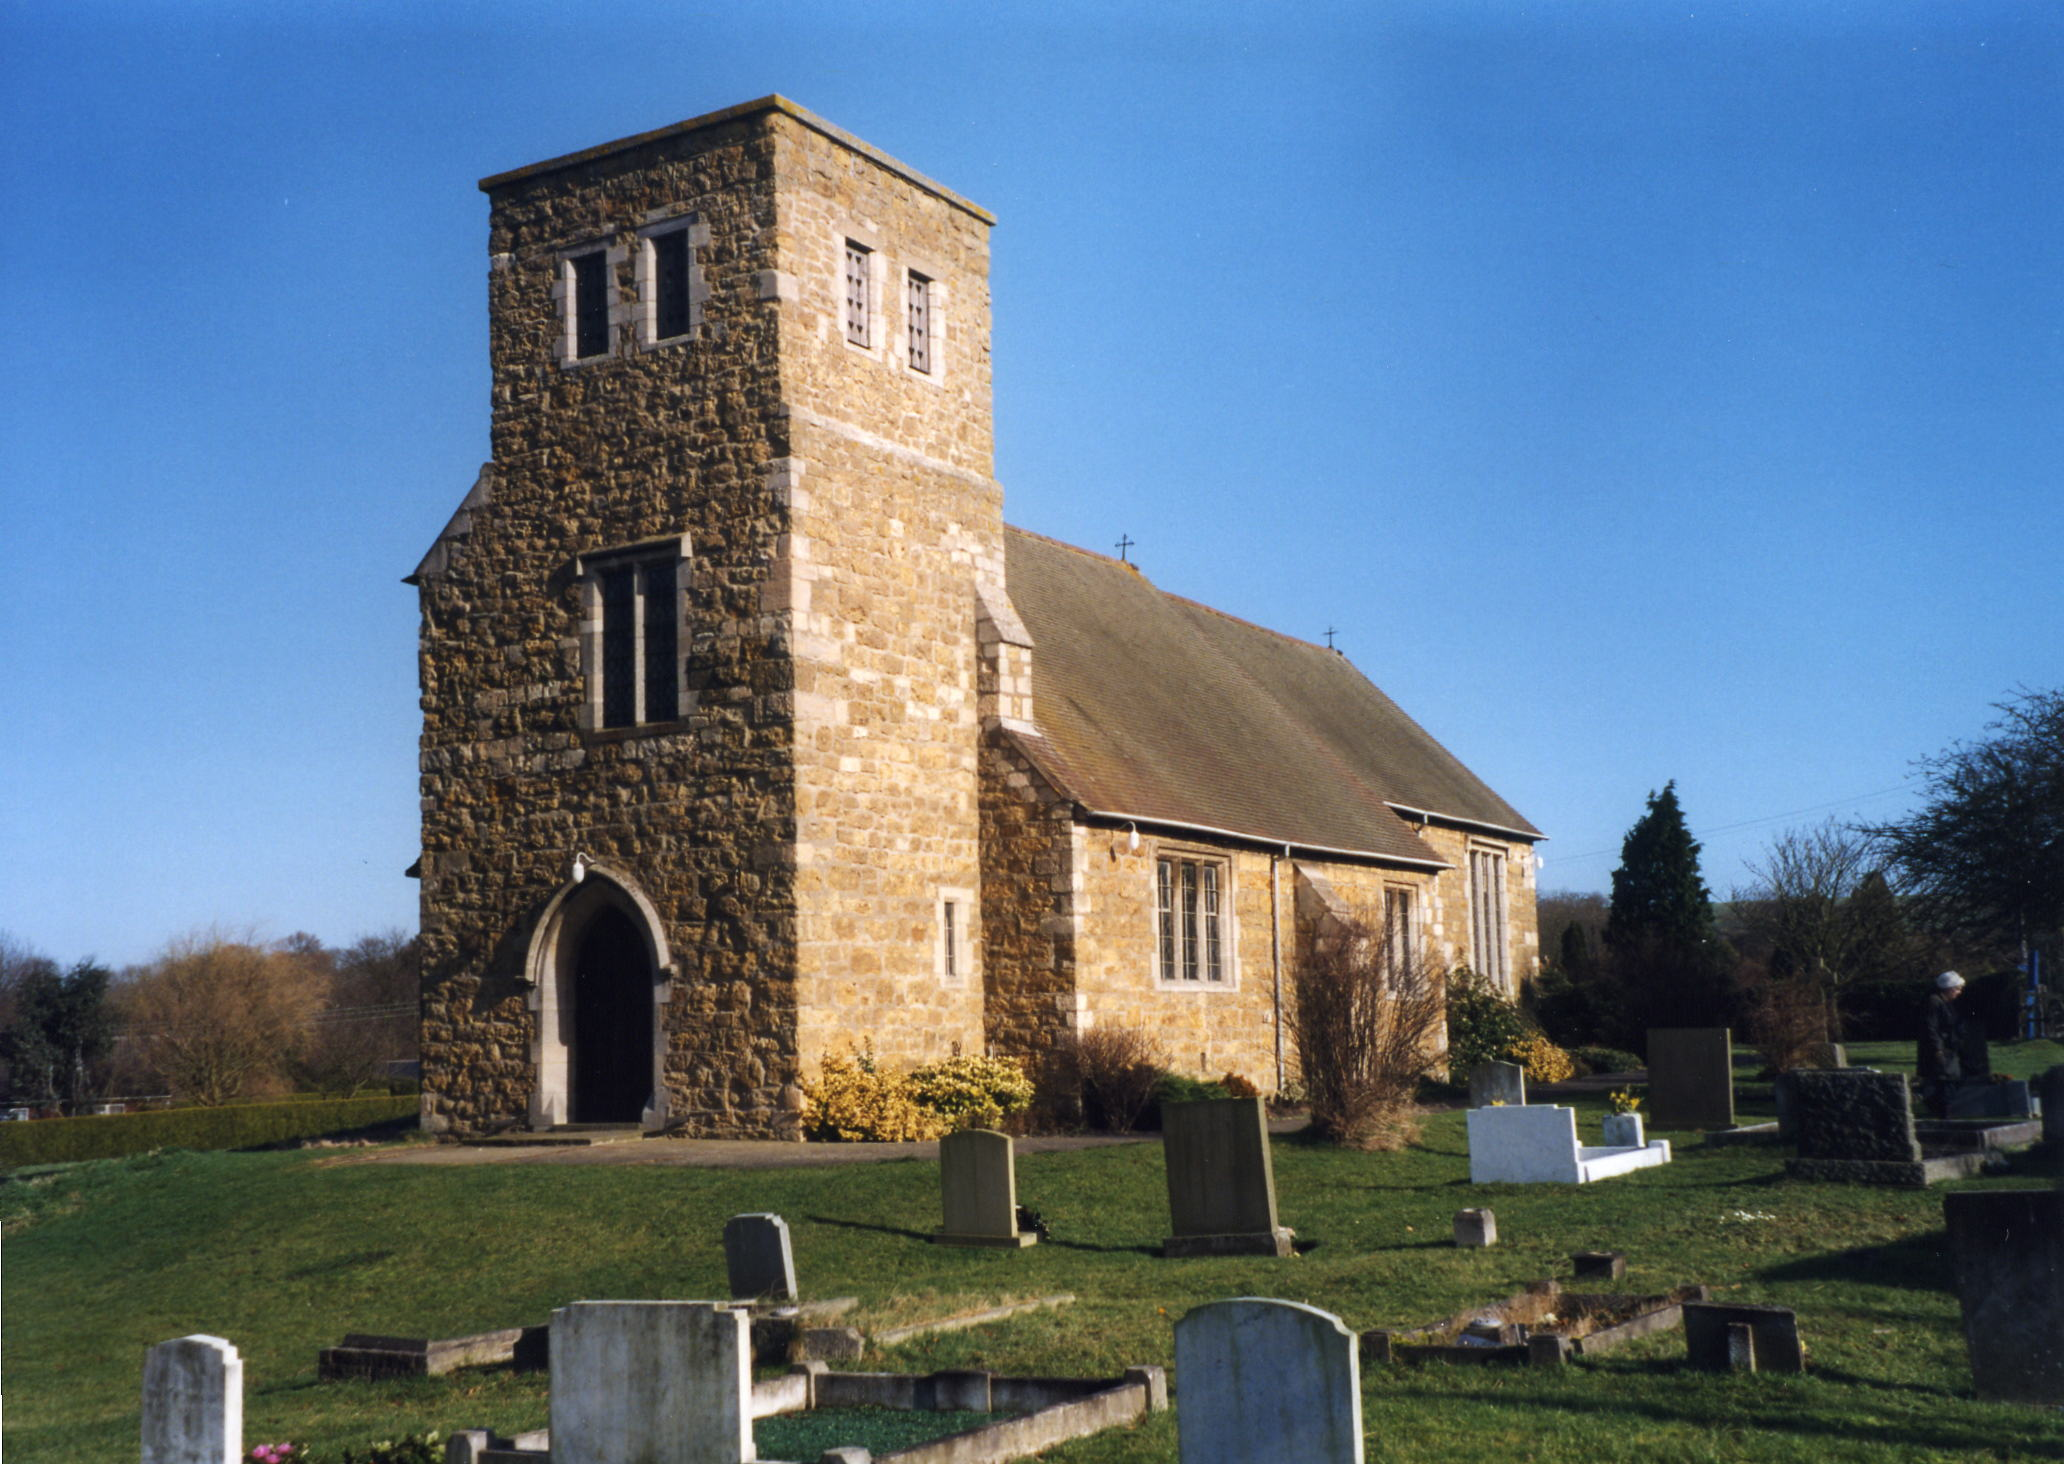 Walesby Saint Mary's church